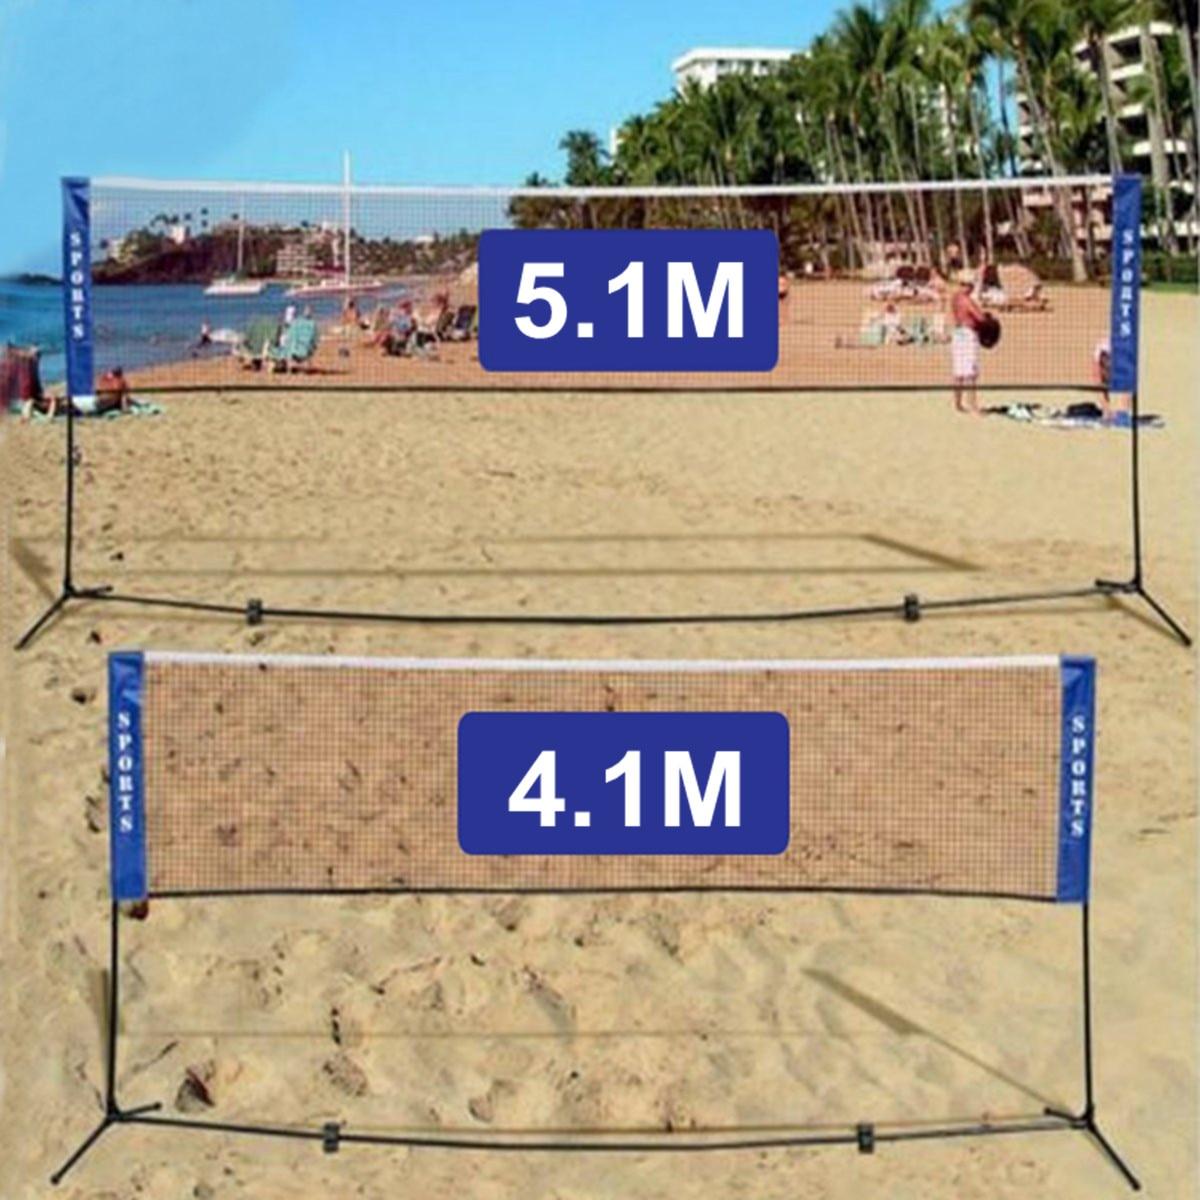 4.1M/5.1M Portable Standard Badminton Net Foldable Professional Volleyball Training Square Mesh Tennis Badminton Square Net